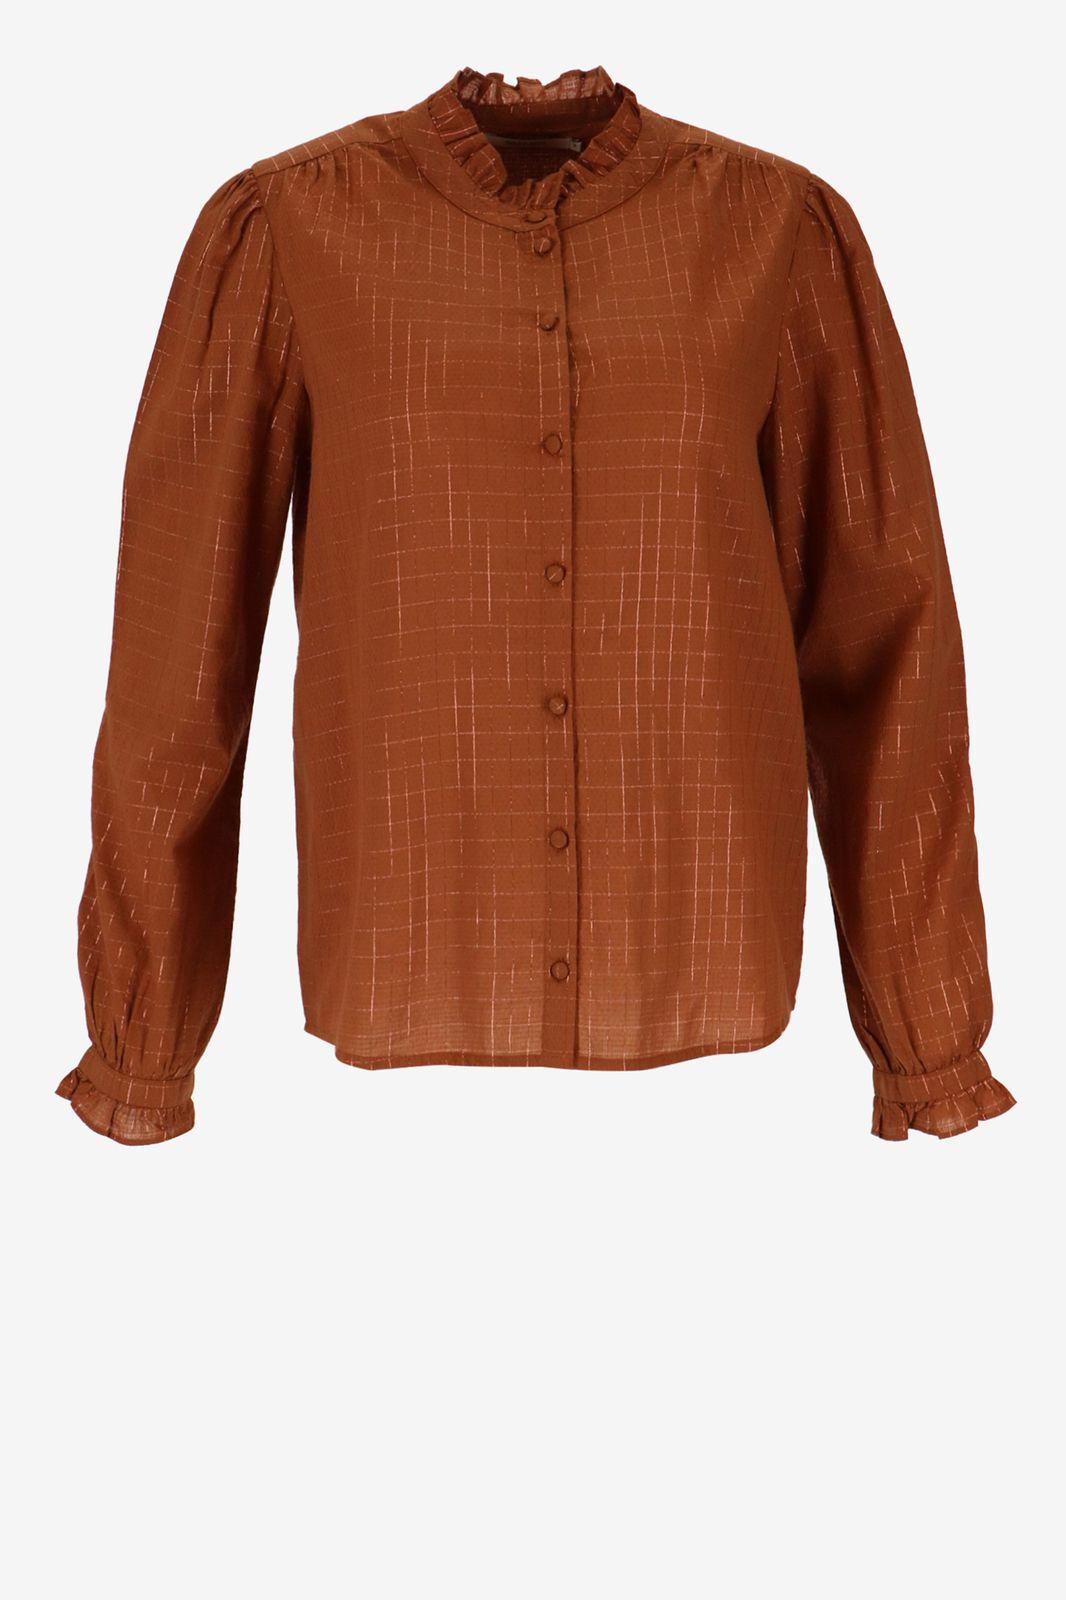 Bruine blouse met vakjes